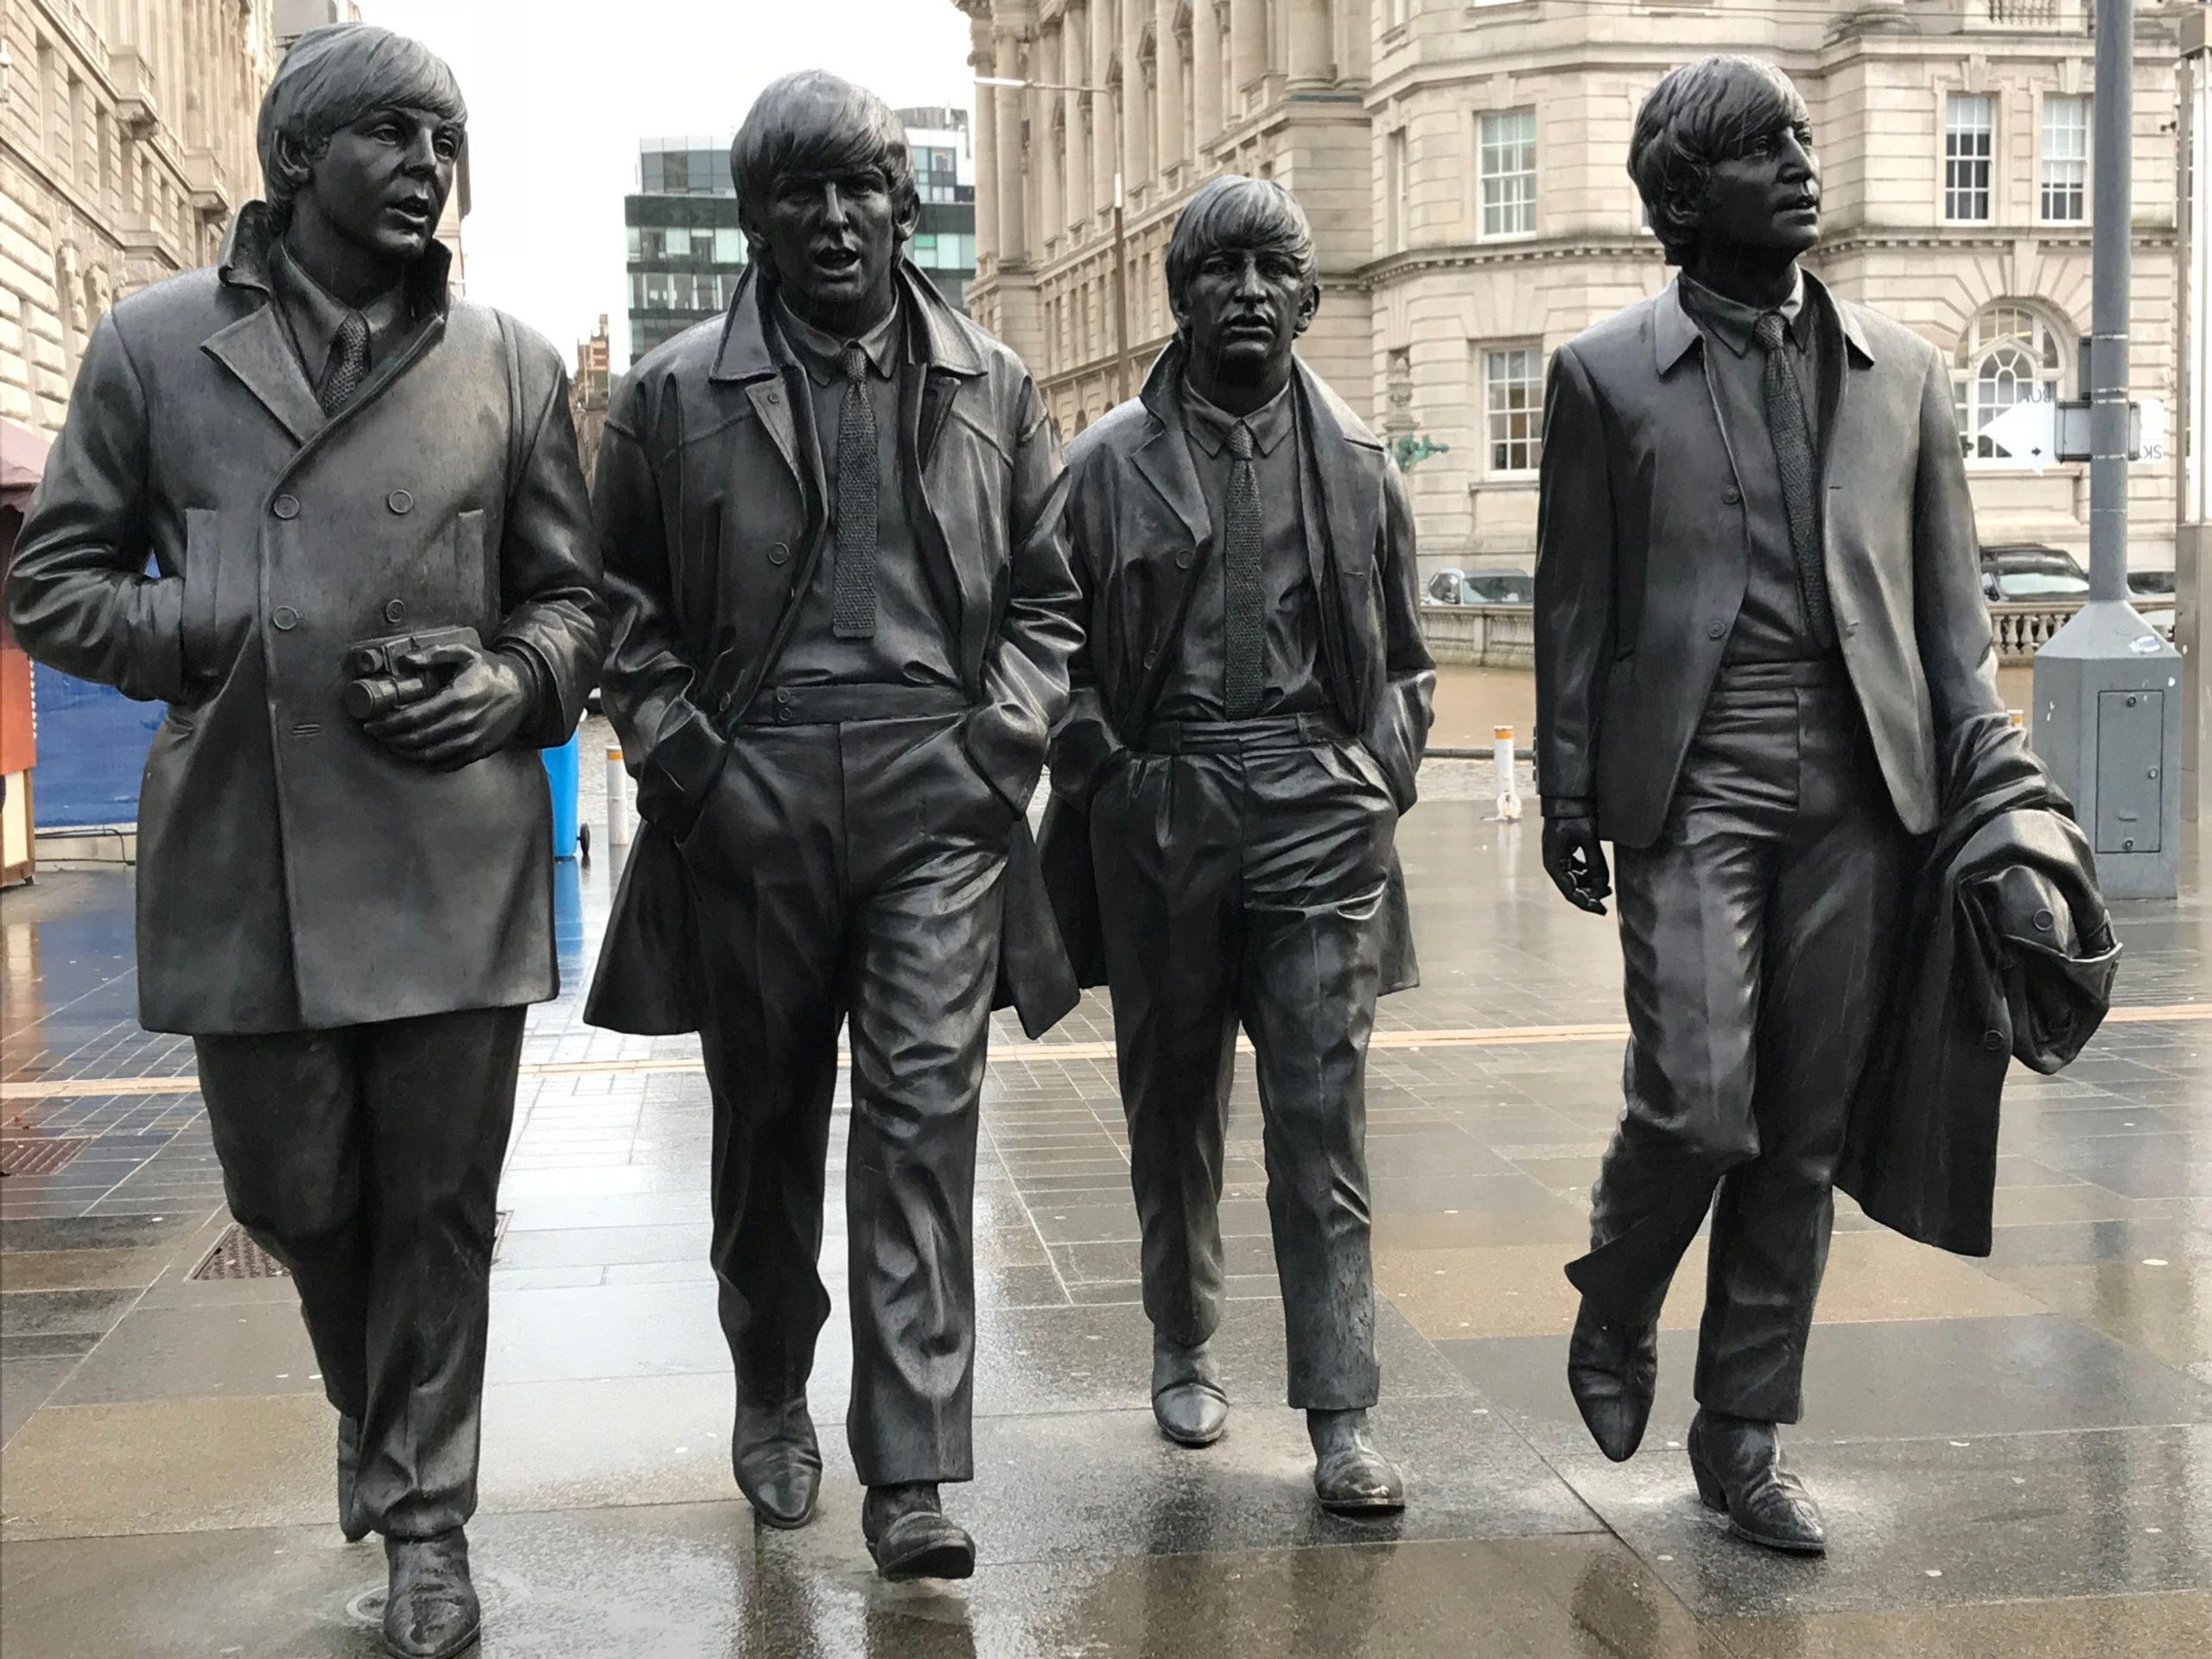 Beatles | www.rabatt-coupon.com